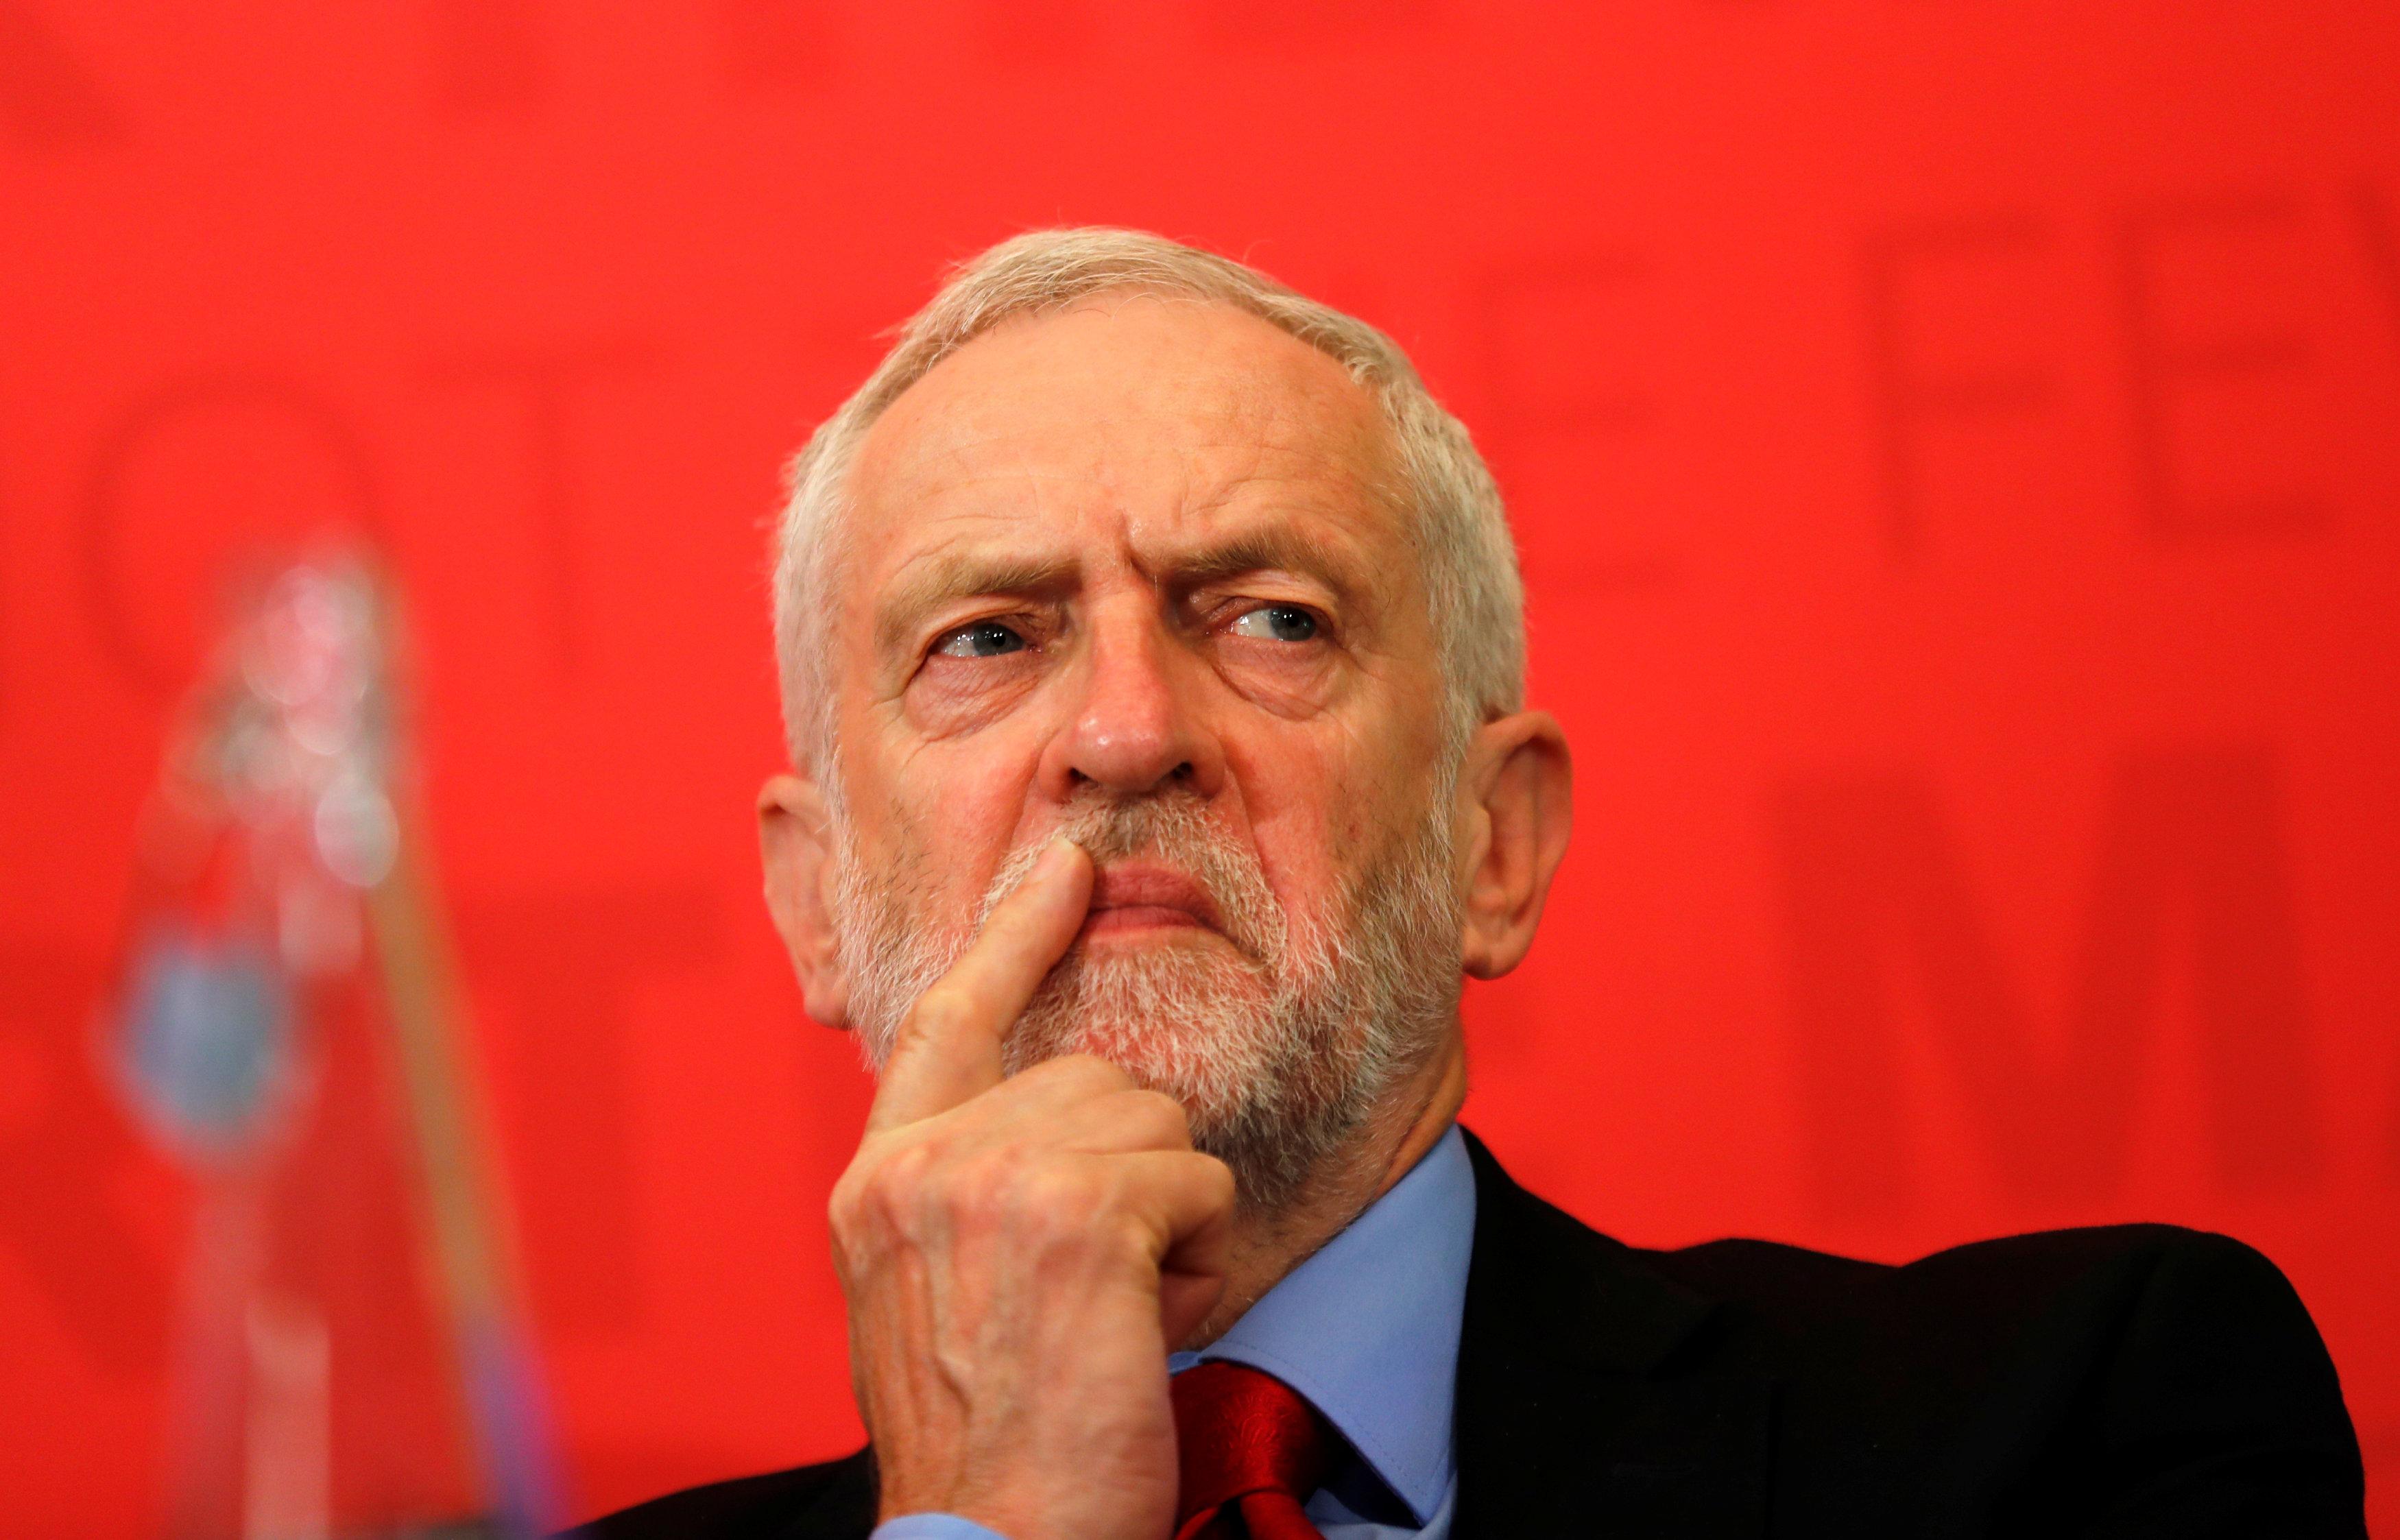 Finance will serve UK under Labour government, warns Corbyn